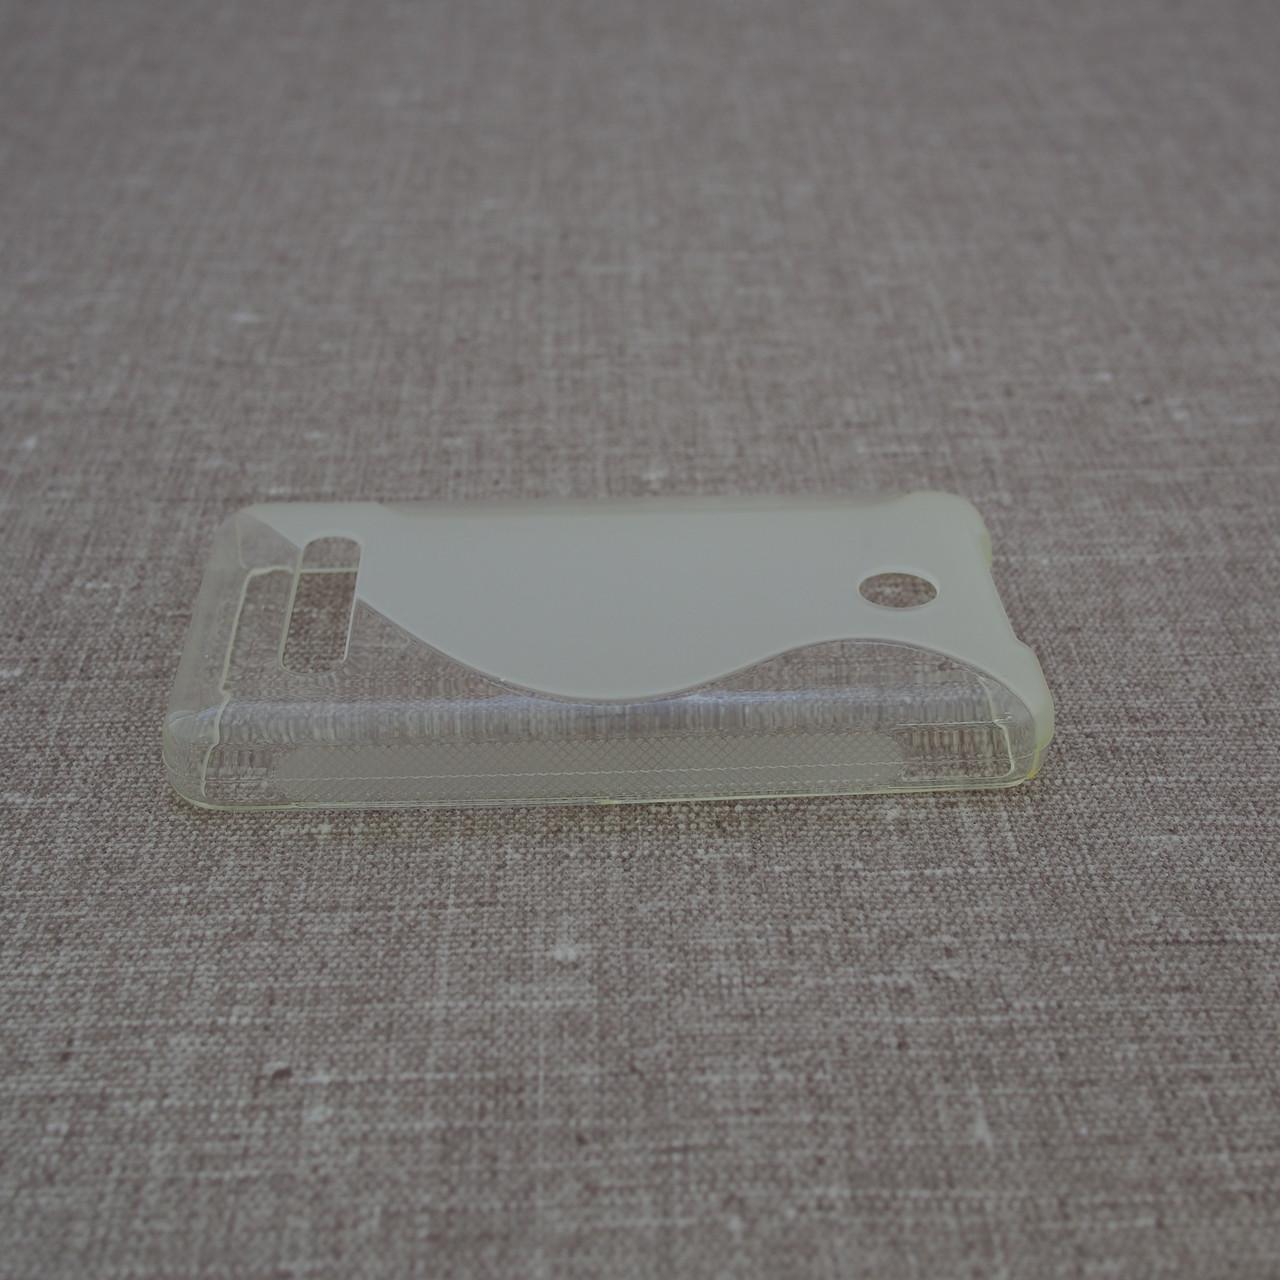 Чехол TPU Duotone Nokia 210 soft-clear Для телефона